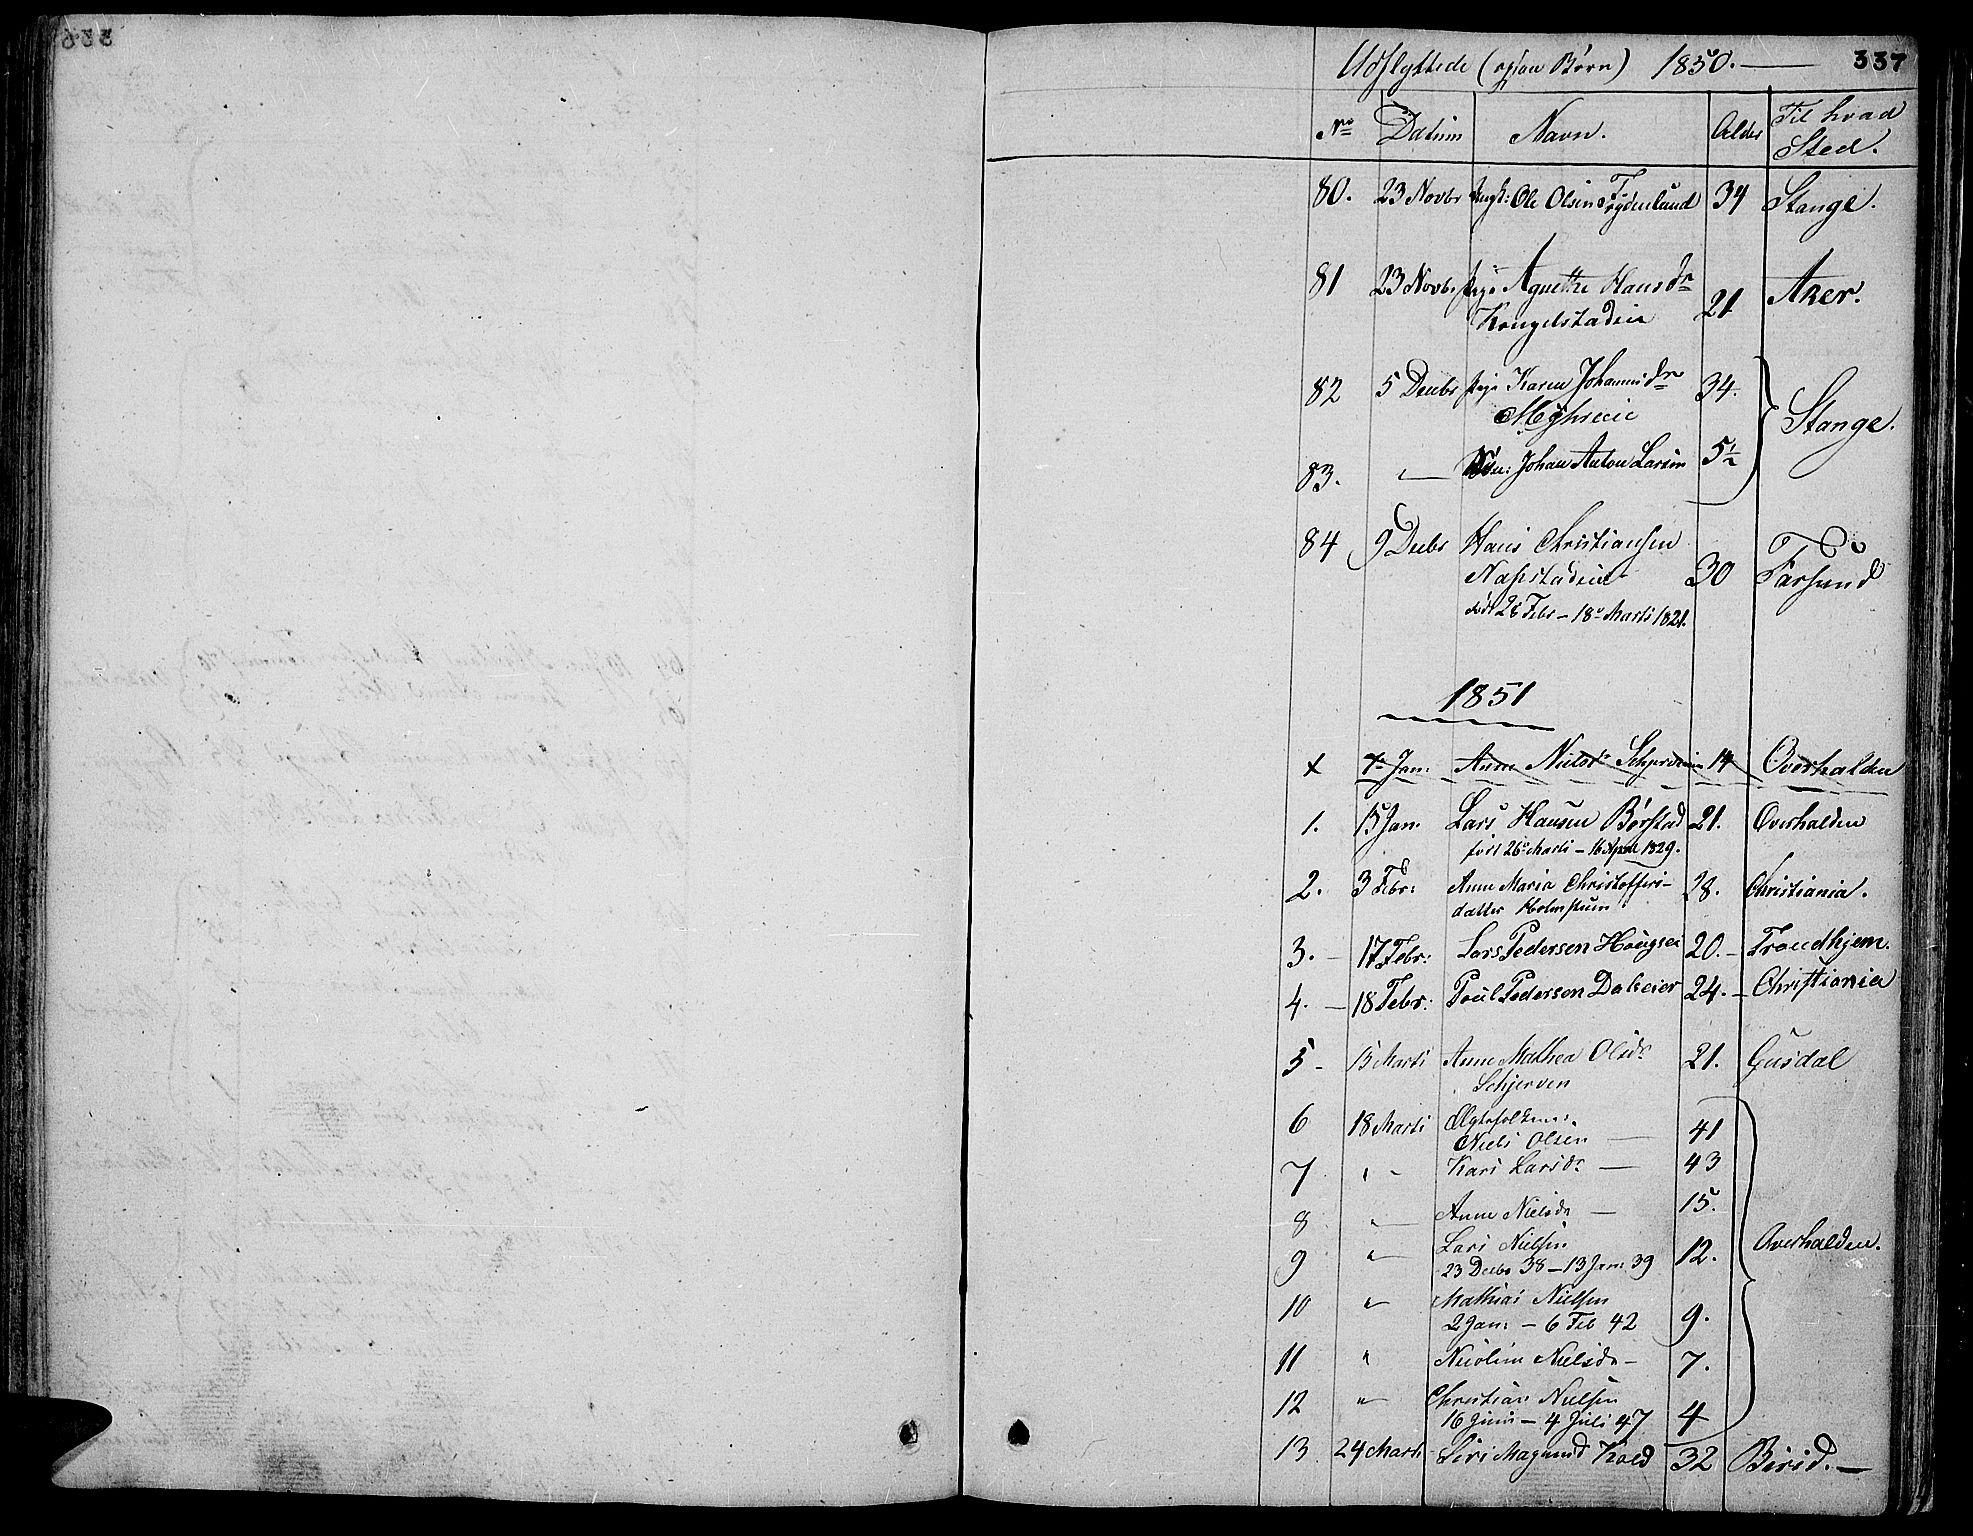 SAH, Vardal prestekontor, H/Ha/Hab/L0004: Klokkerbok nr. 4, 1831-1853, s. 337